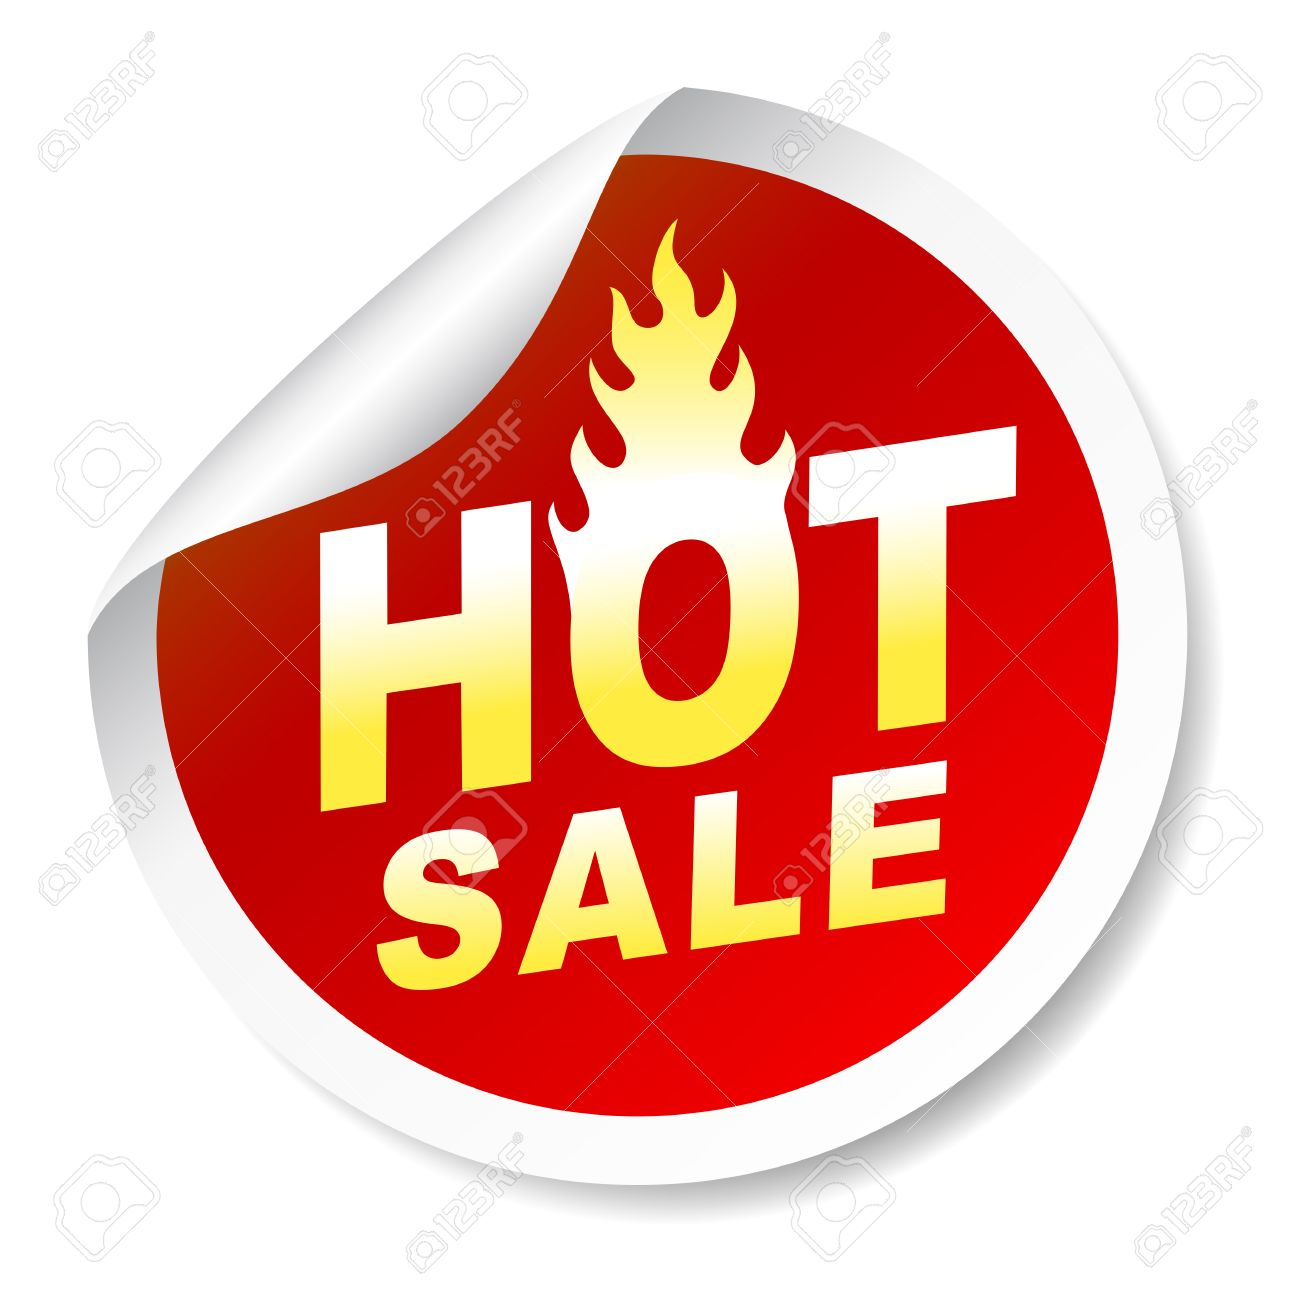 hot sale sticker badge with flame royalty free cliparts vectors rh 123rf com sale victoria secret sale victoria australia